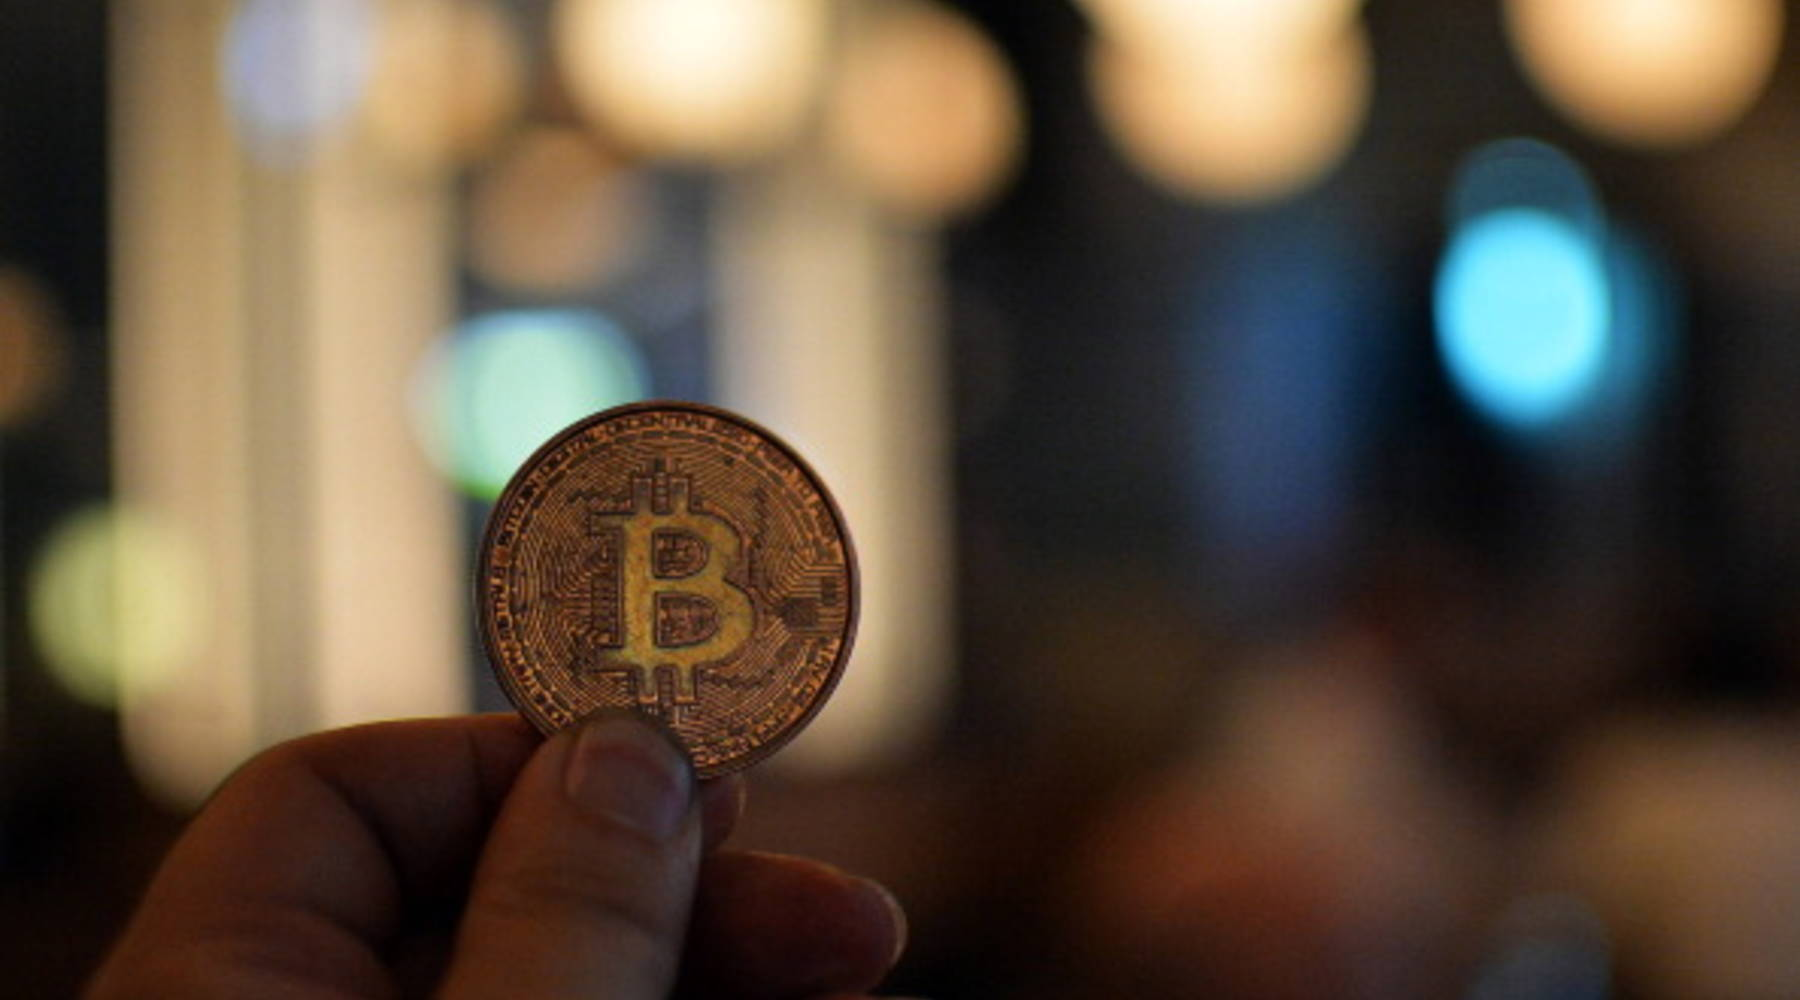 Can you explain blockchain in just a few sentences?